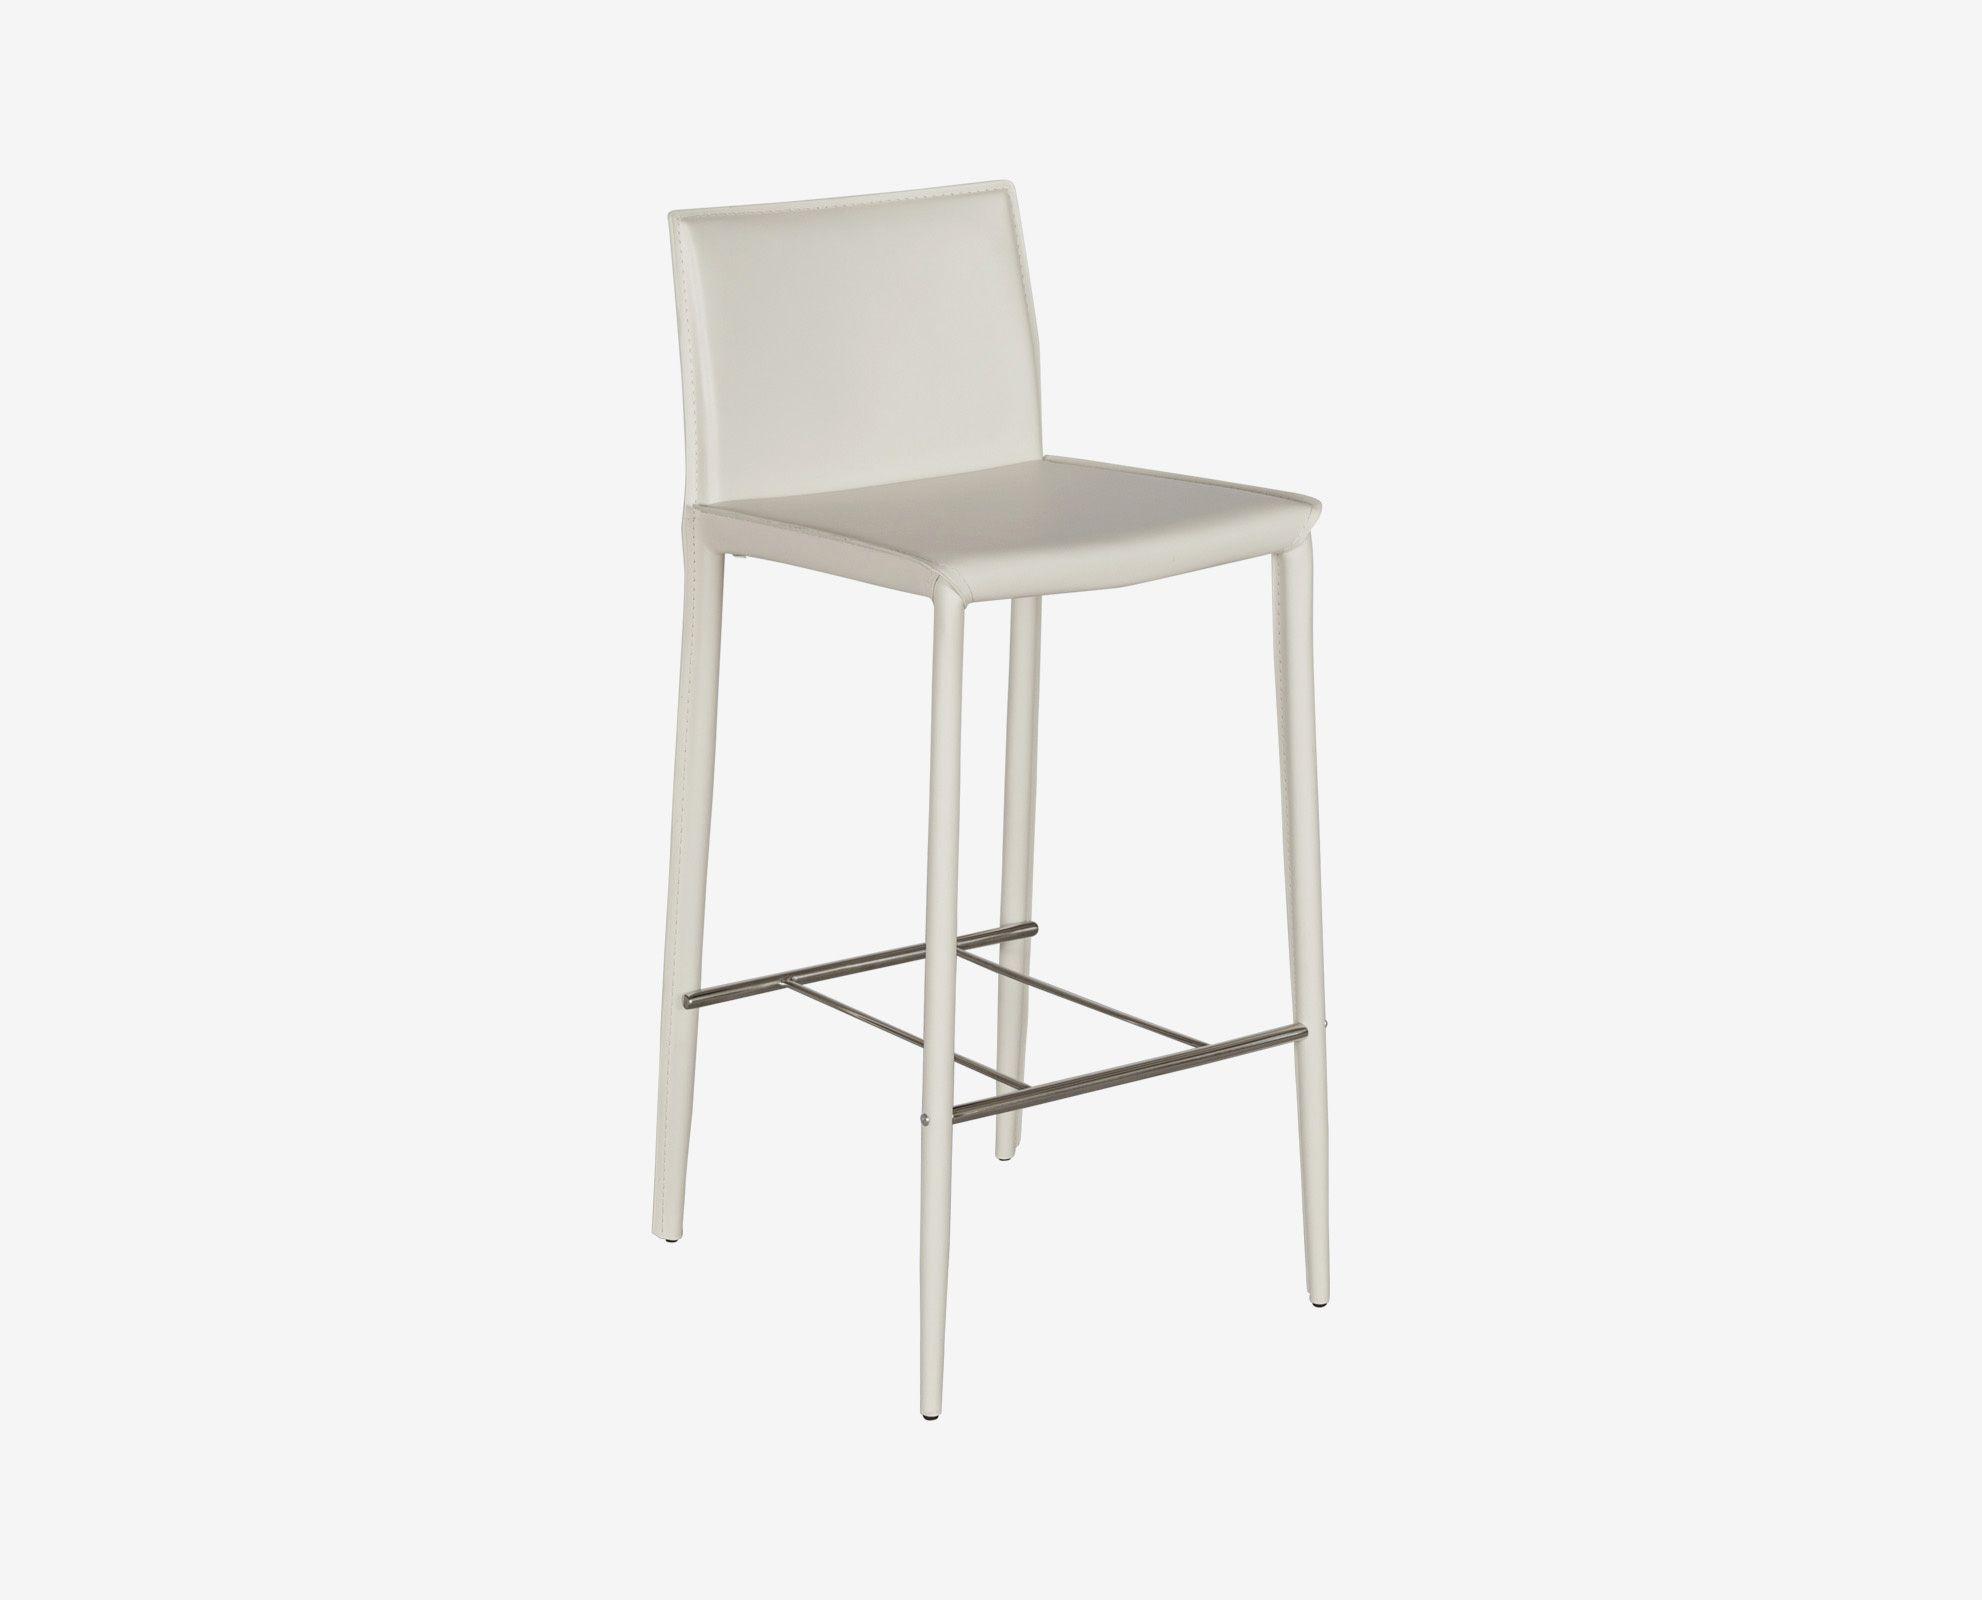 Fantastic Bastian Barstool Goodview Kitchen Counter Stools Bar Lamtechconsult Wood Chair Design Ideas Lamtechconsultcom